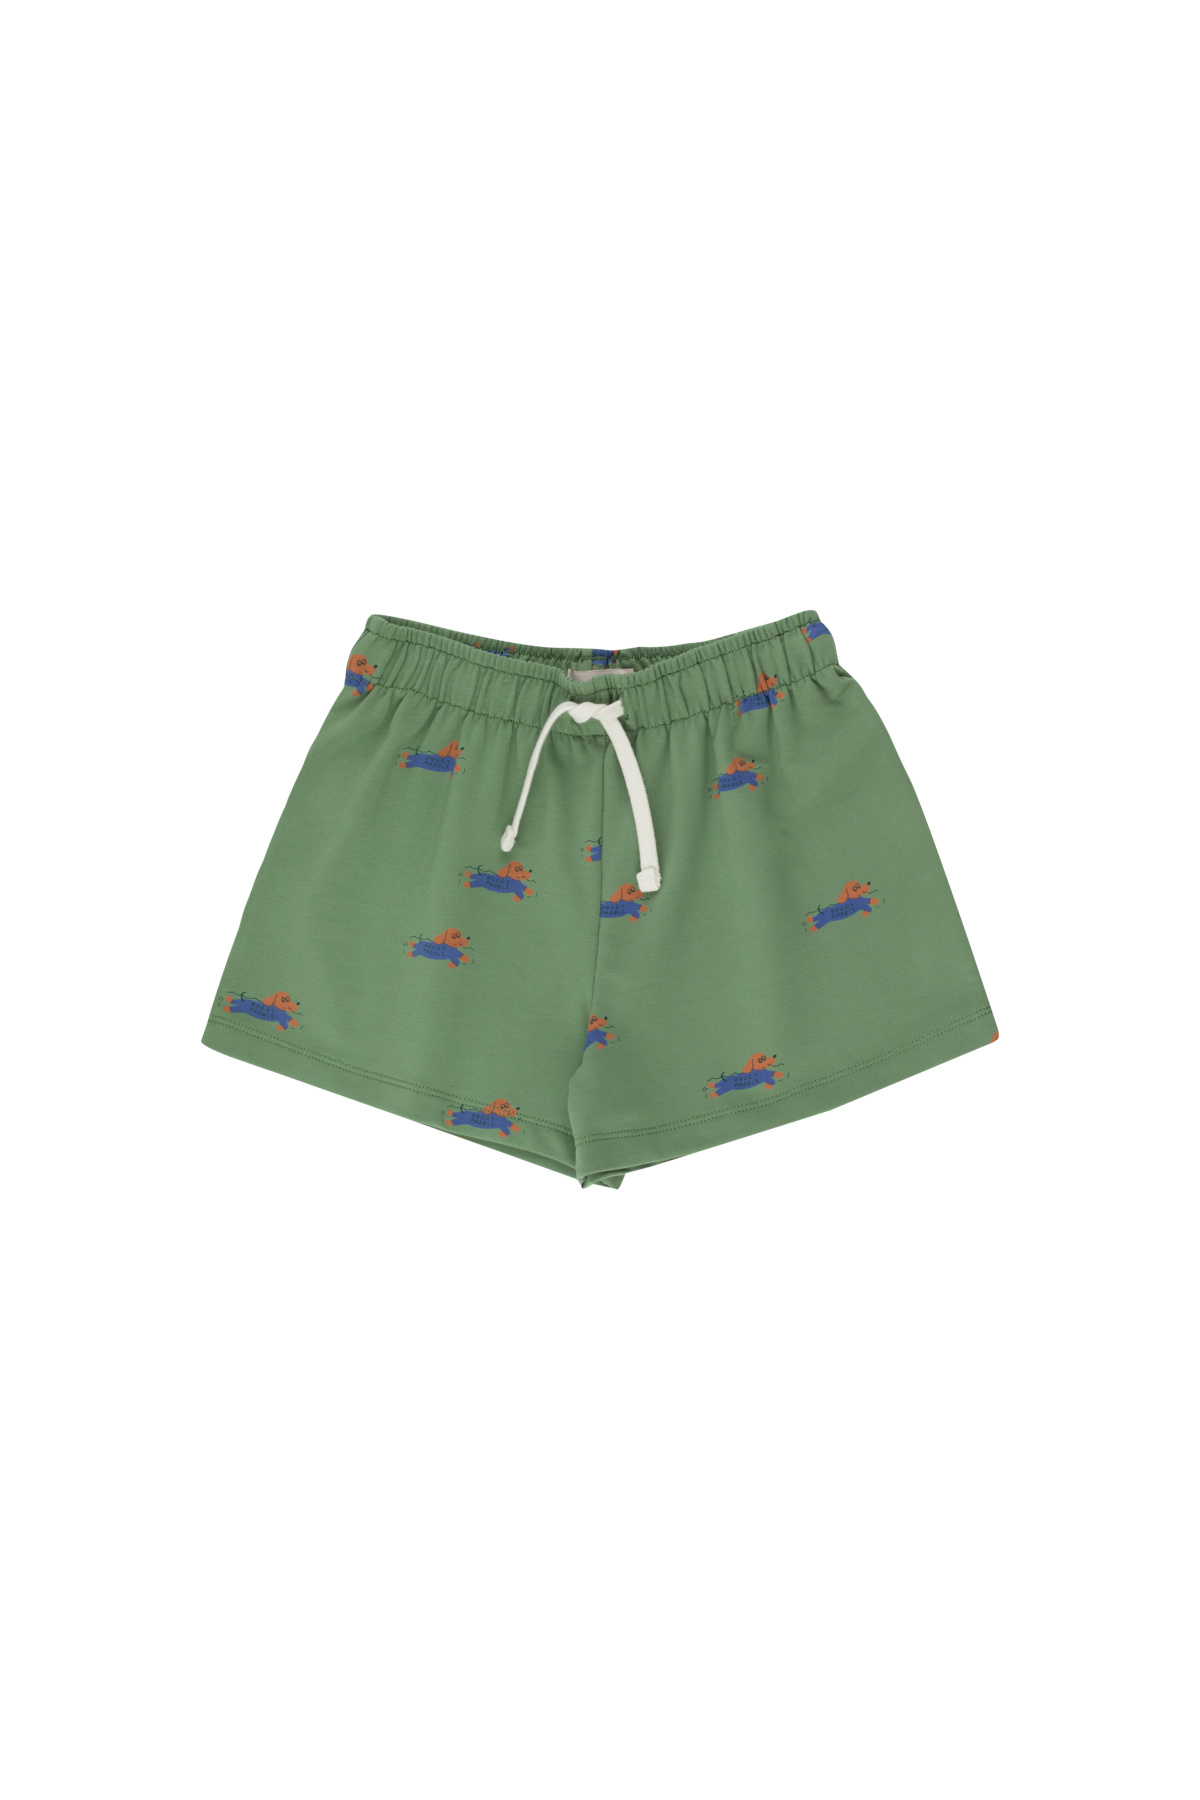 Doggy paddle short - Green / Iris Blue-1